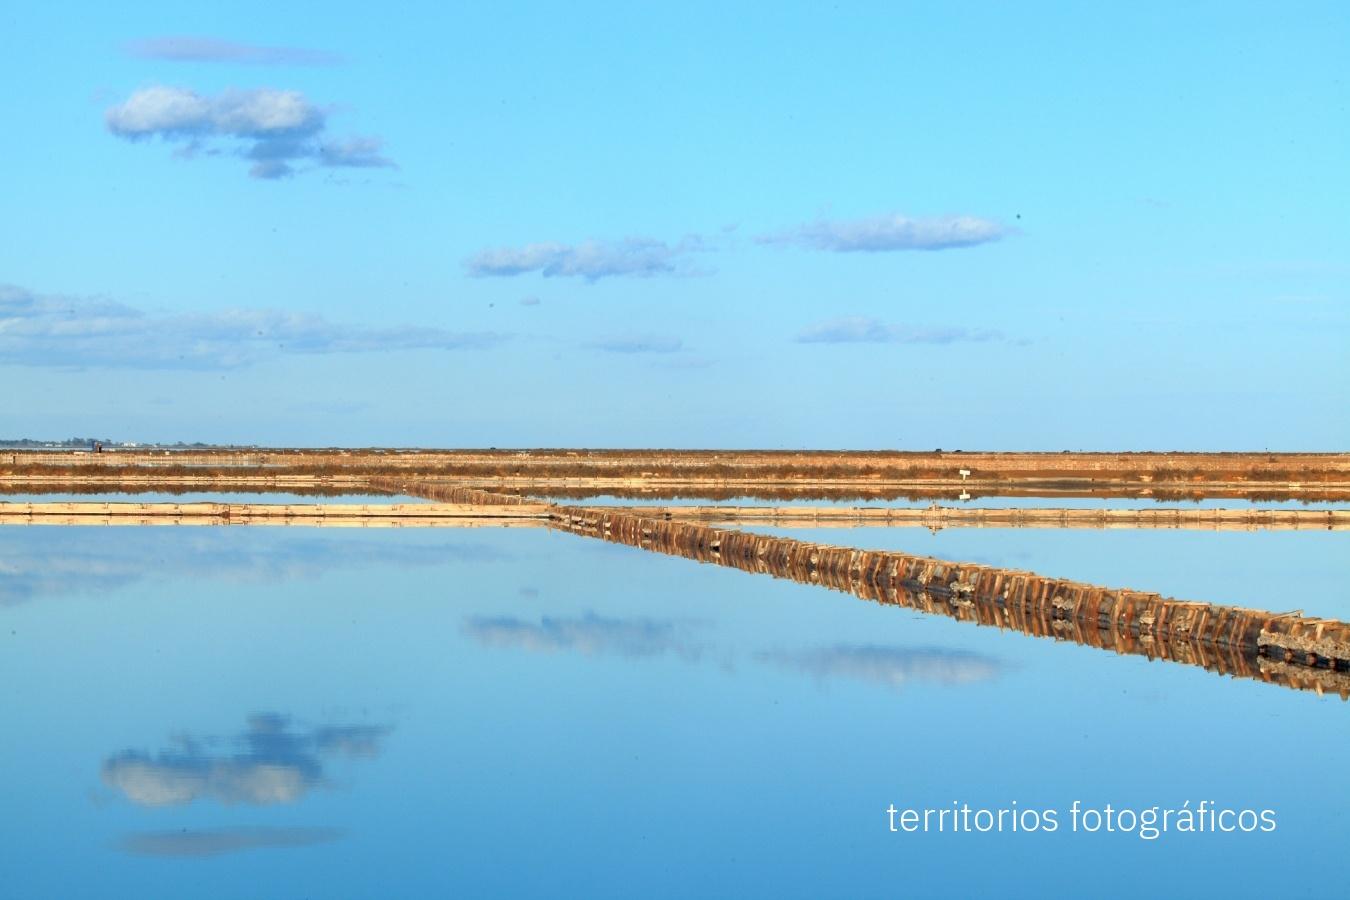 reflections - territorios fotográficos